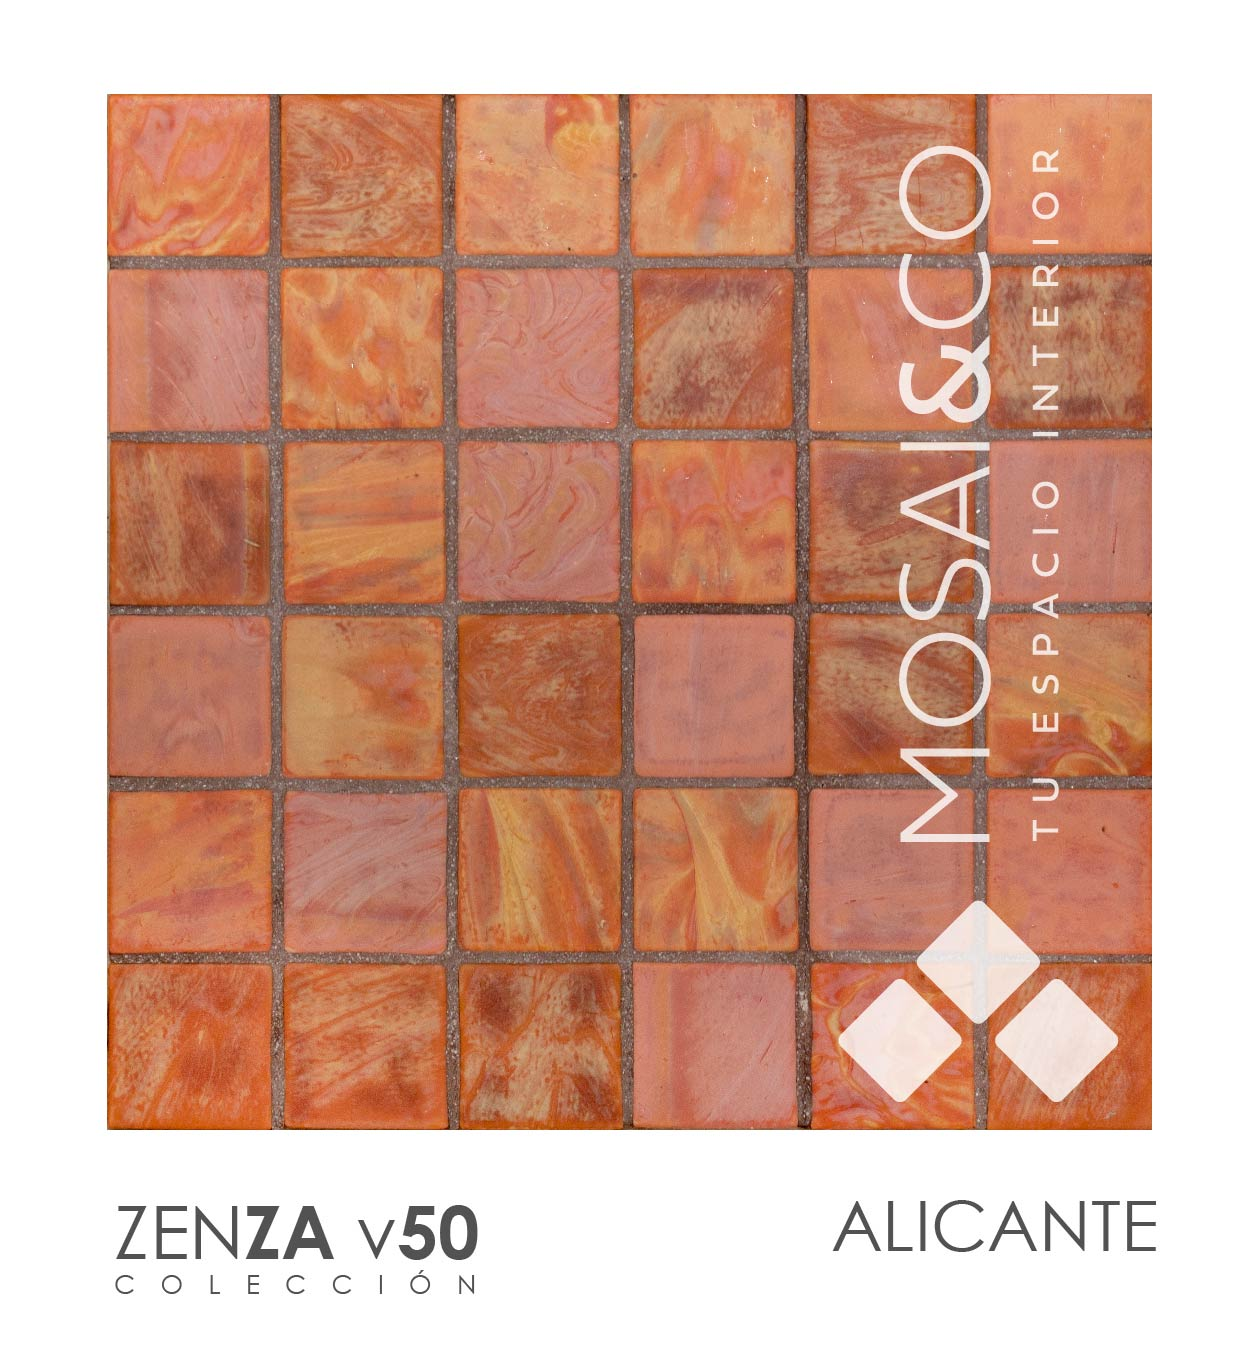 mosaico-decoracion-interiores-mosaiandco-coleccion-zenza-v50_Alicante